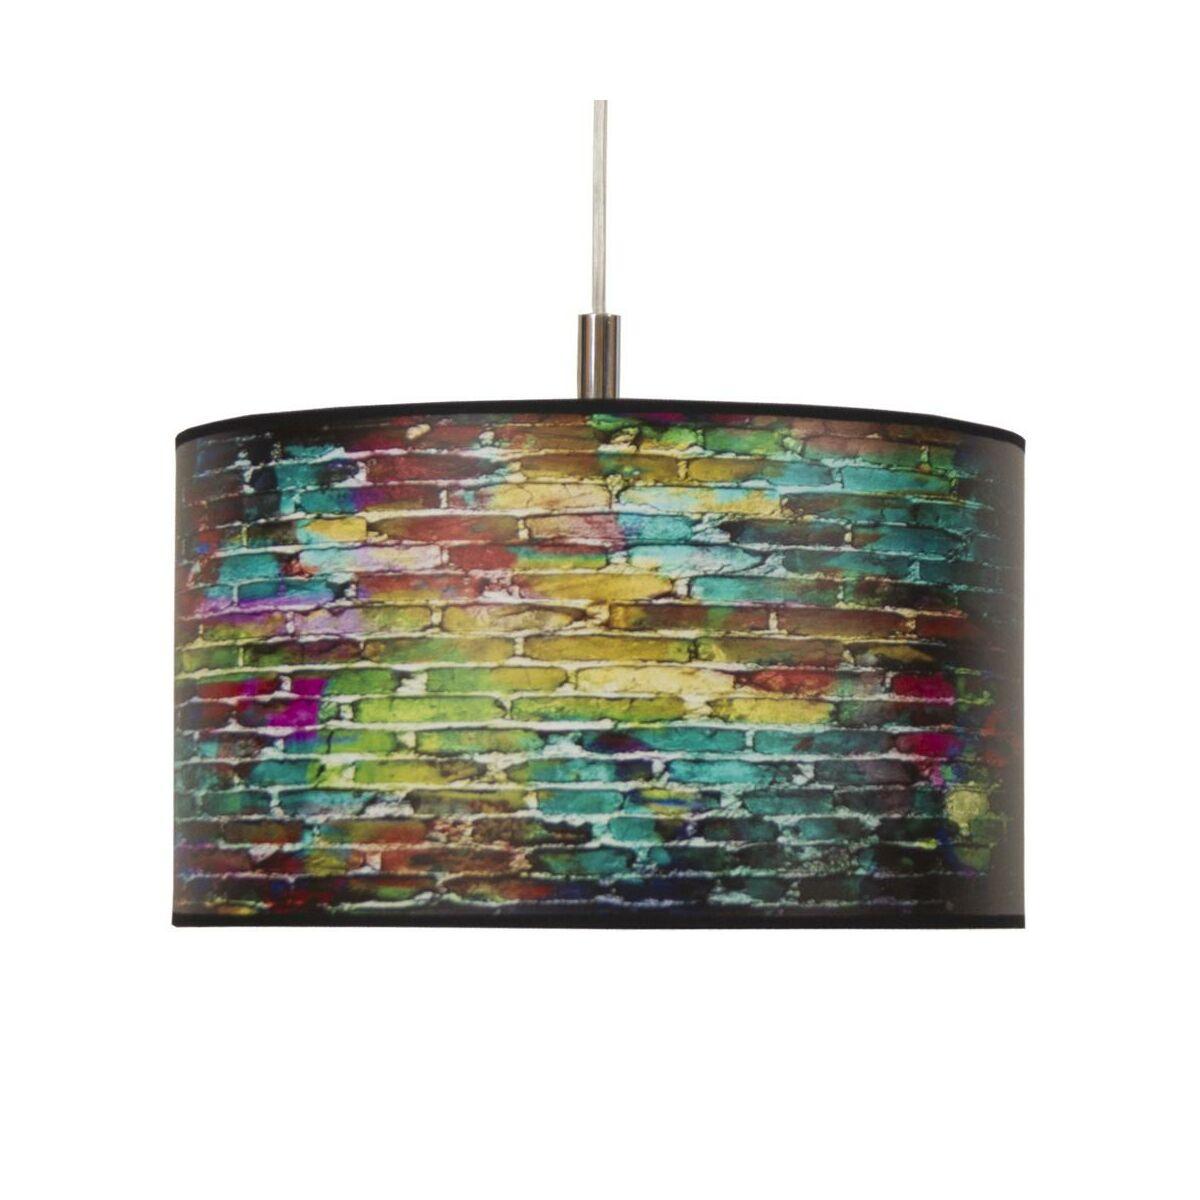 Lampa wisz ca logo graffiti kandel serie lamp w atrakcyjnej cenie w sklepach leroy merlin - Graffiti leroy merlin behang ...